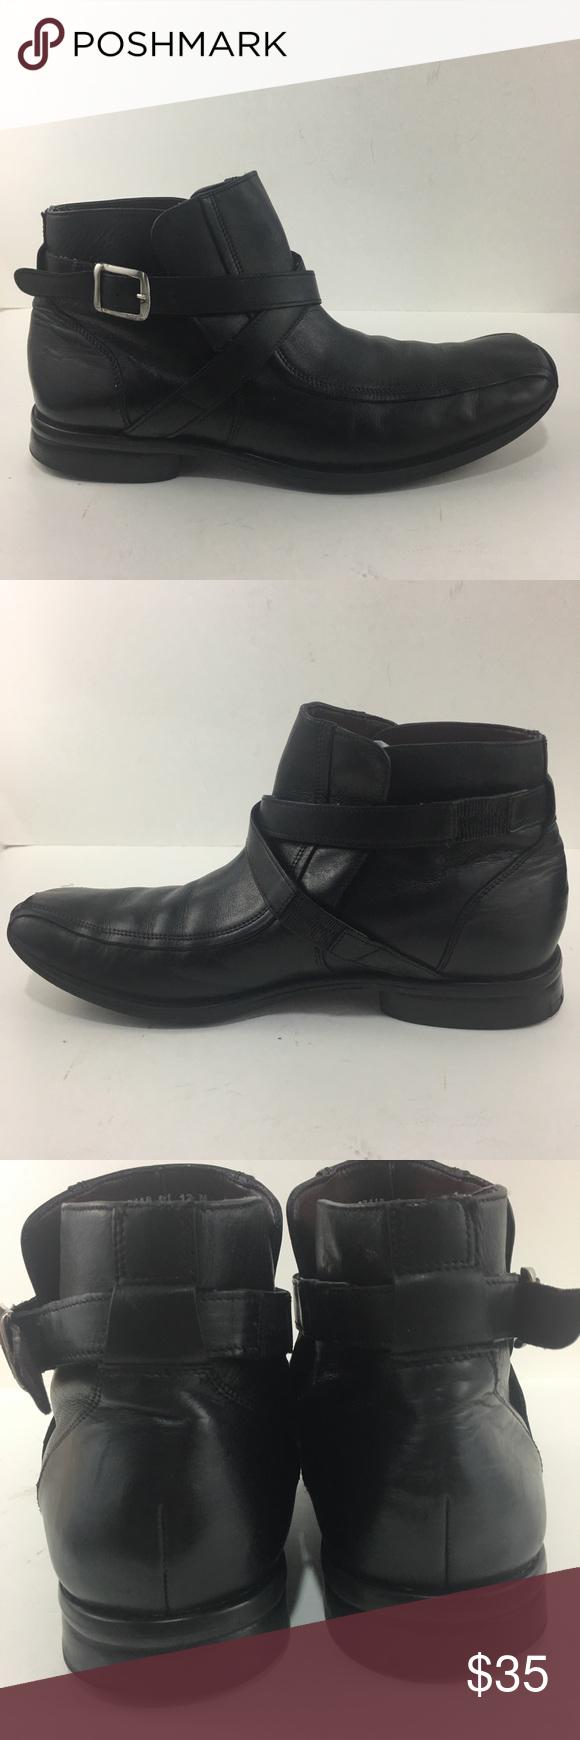 ⬇️💥 Nunn Bush Nxxt Black Leather Slip On Boots Slip On